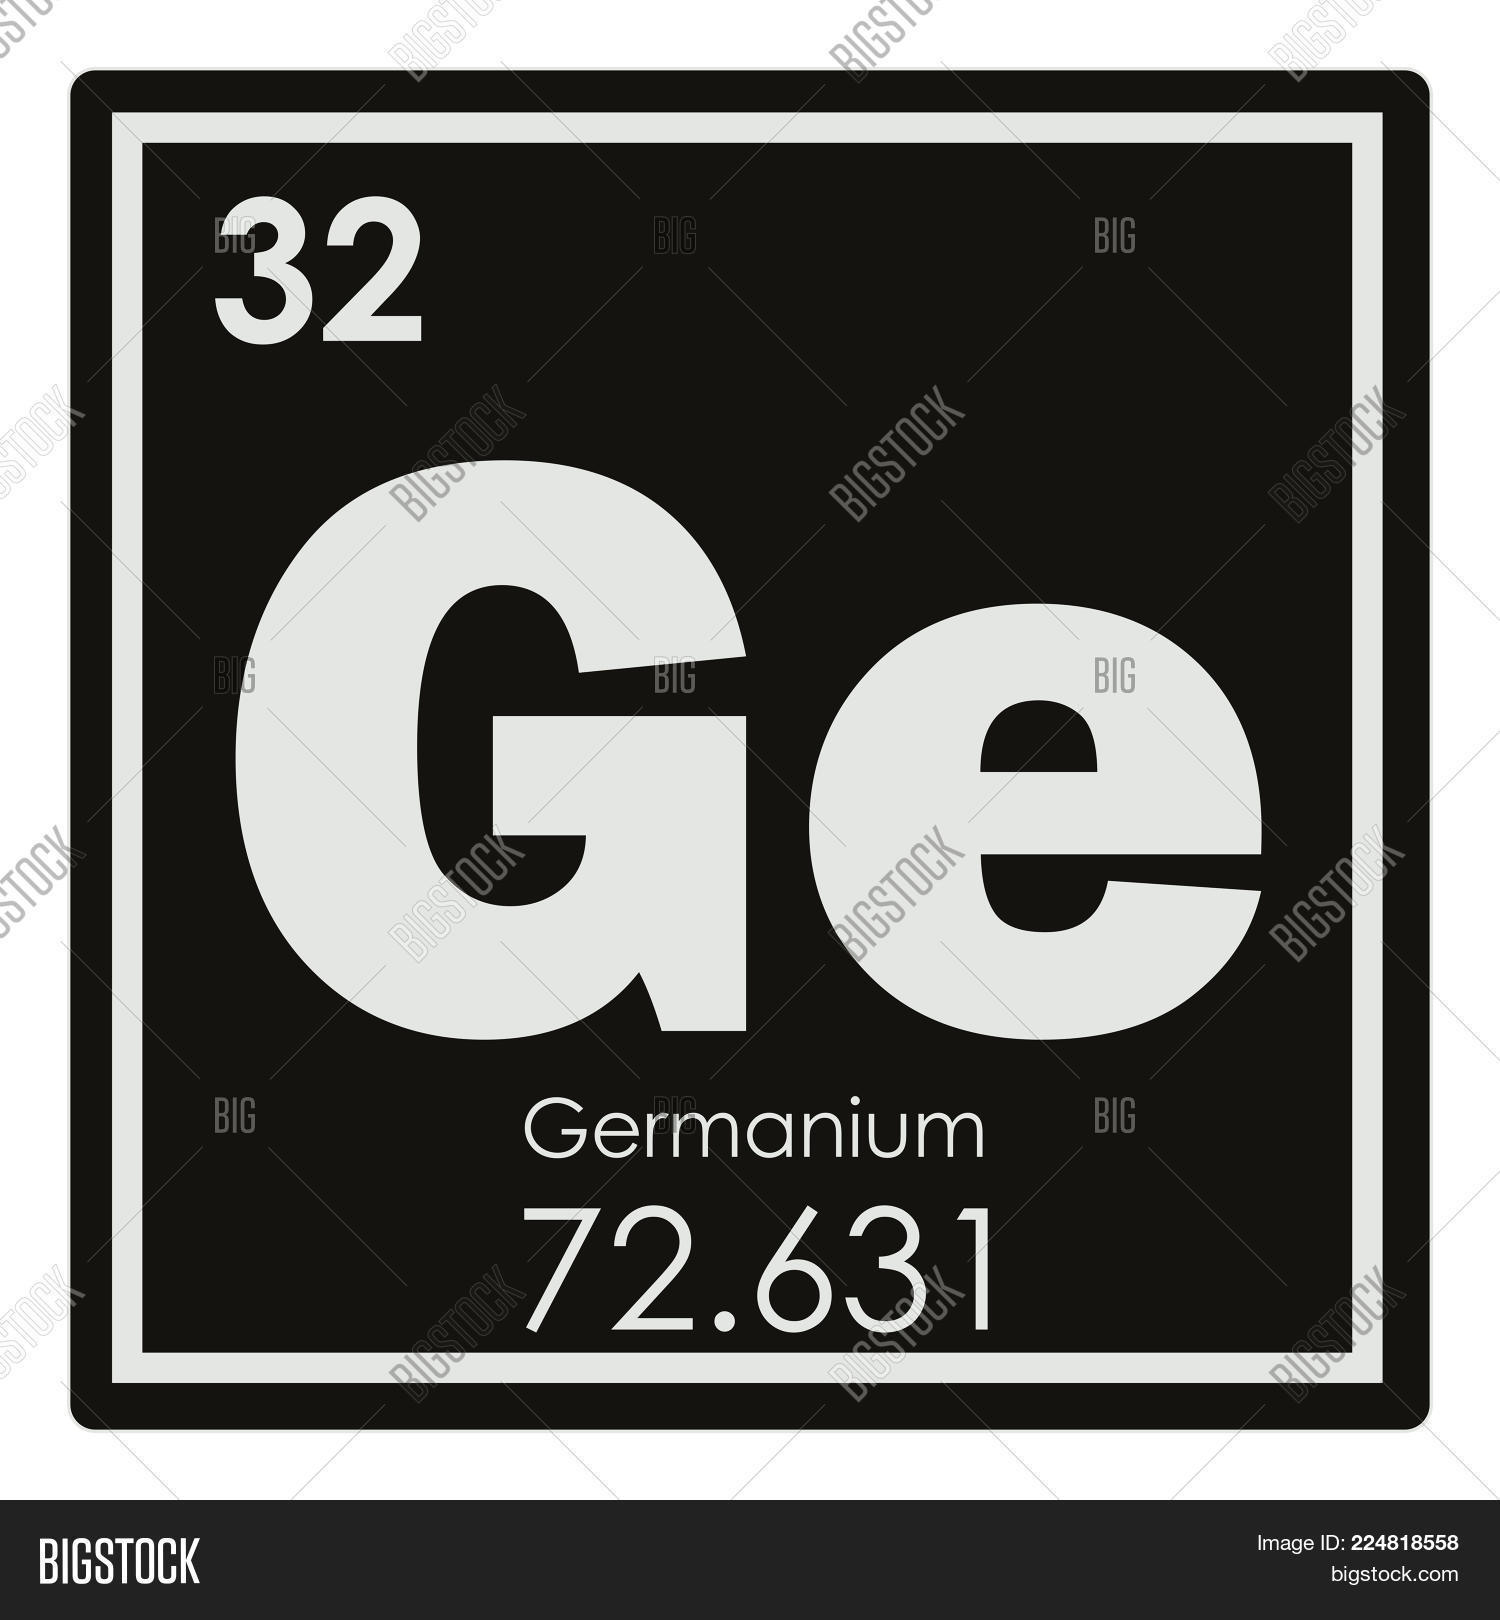 Germanium Chemical Image Photo Free Trial Bigstock